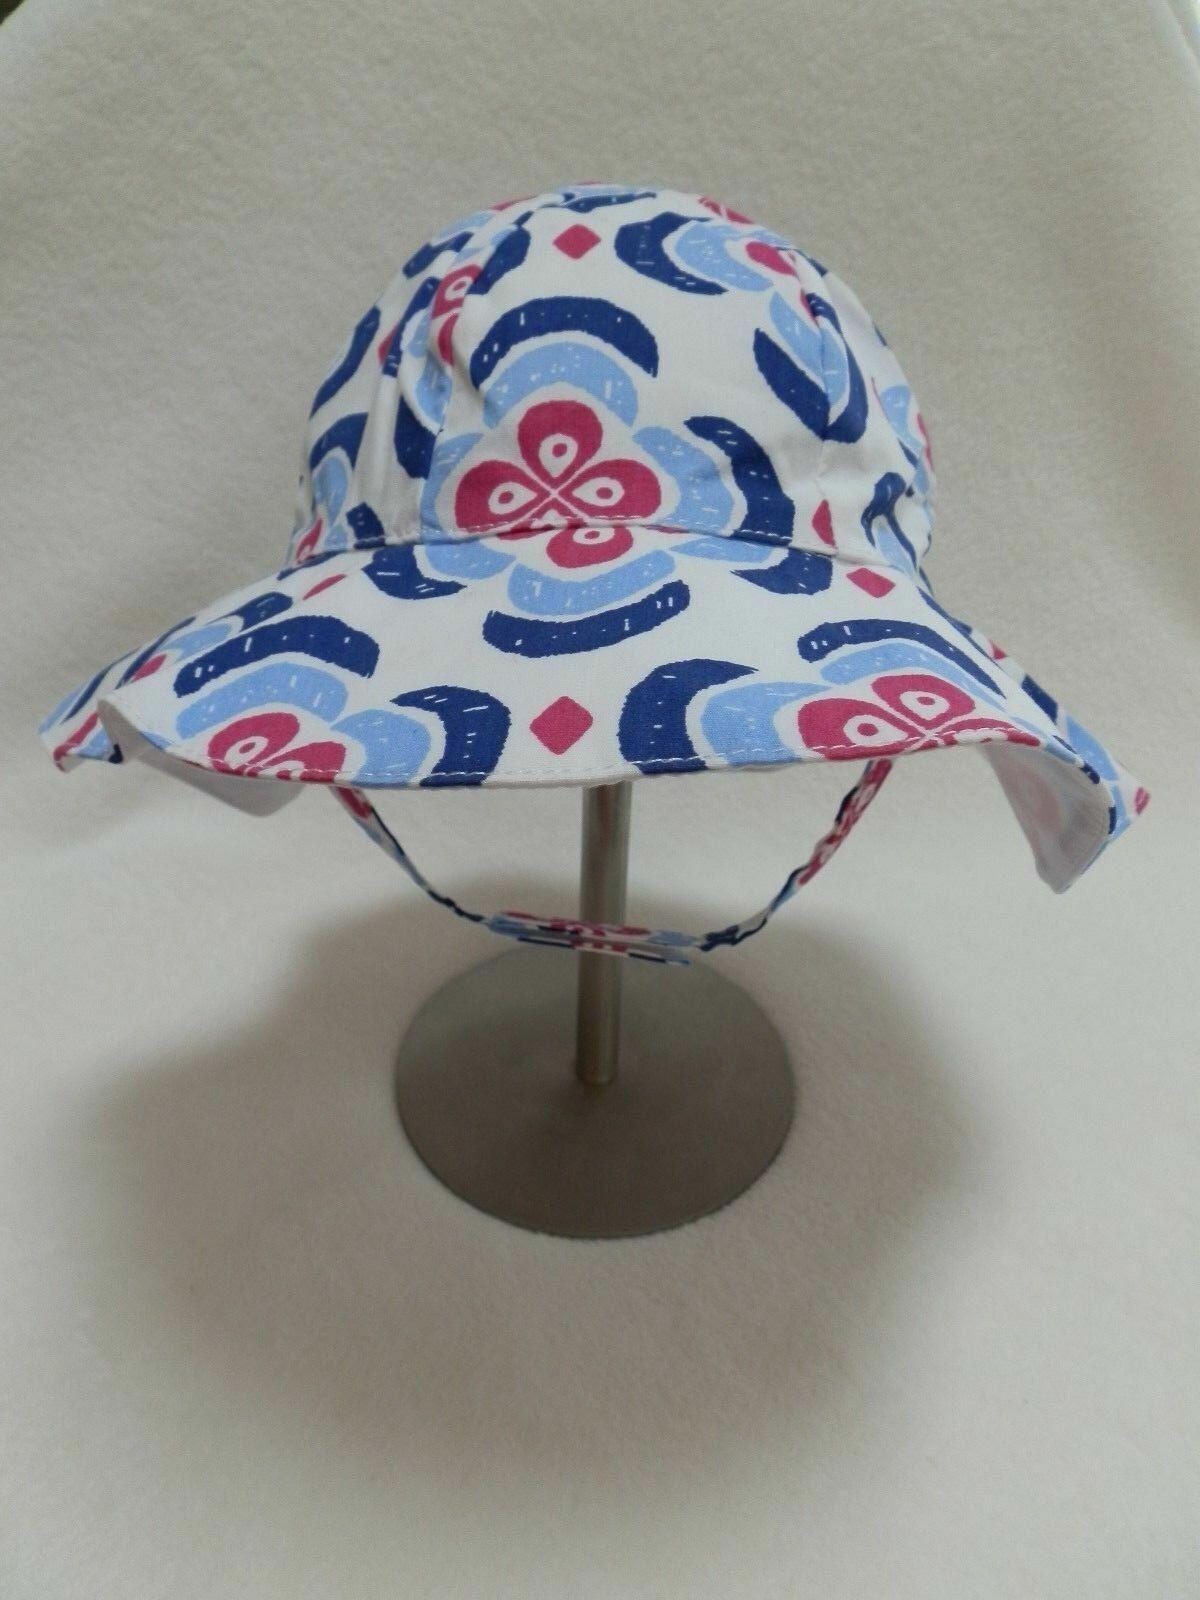 Gymboree Baby Girls Sun Beach Hat 6-12 mo w/ Chin Strap Blue